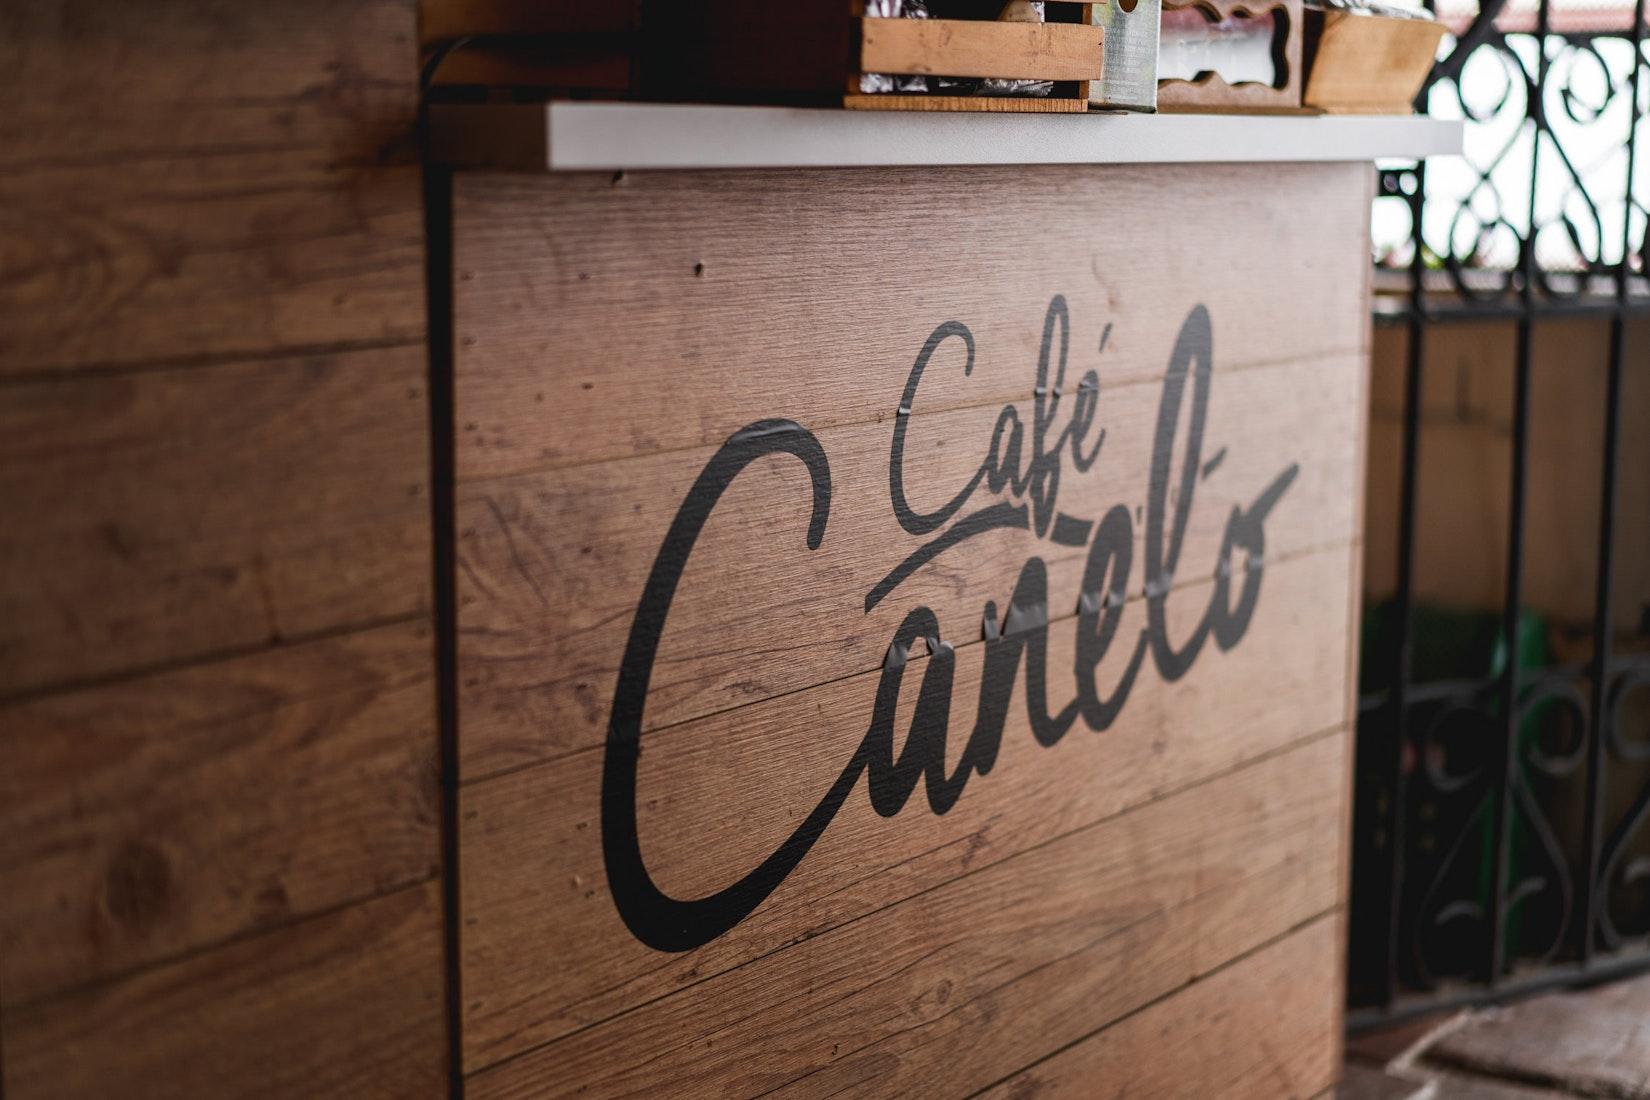 Sign of Cafe Canelo, the best cafe in Santa Fe de Antioquia